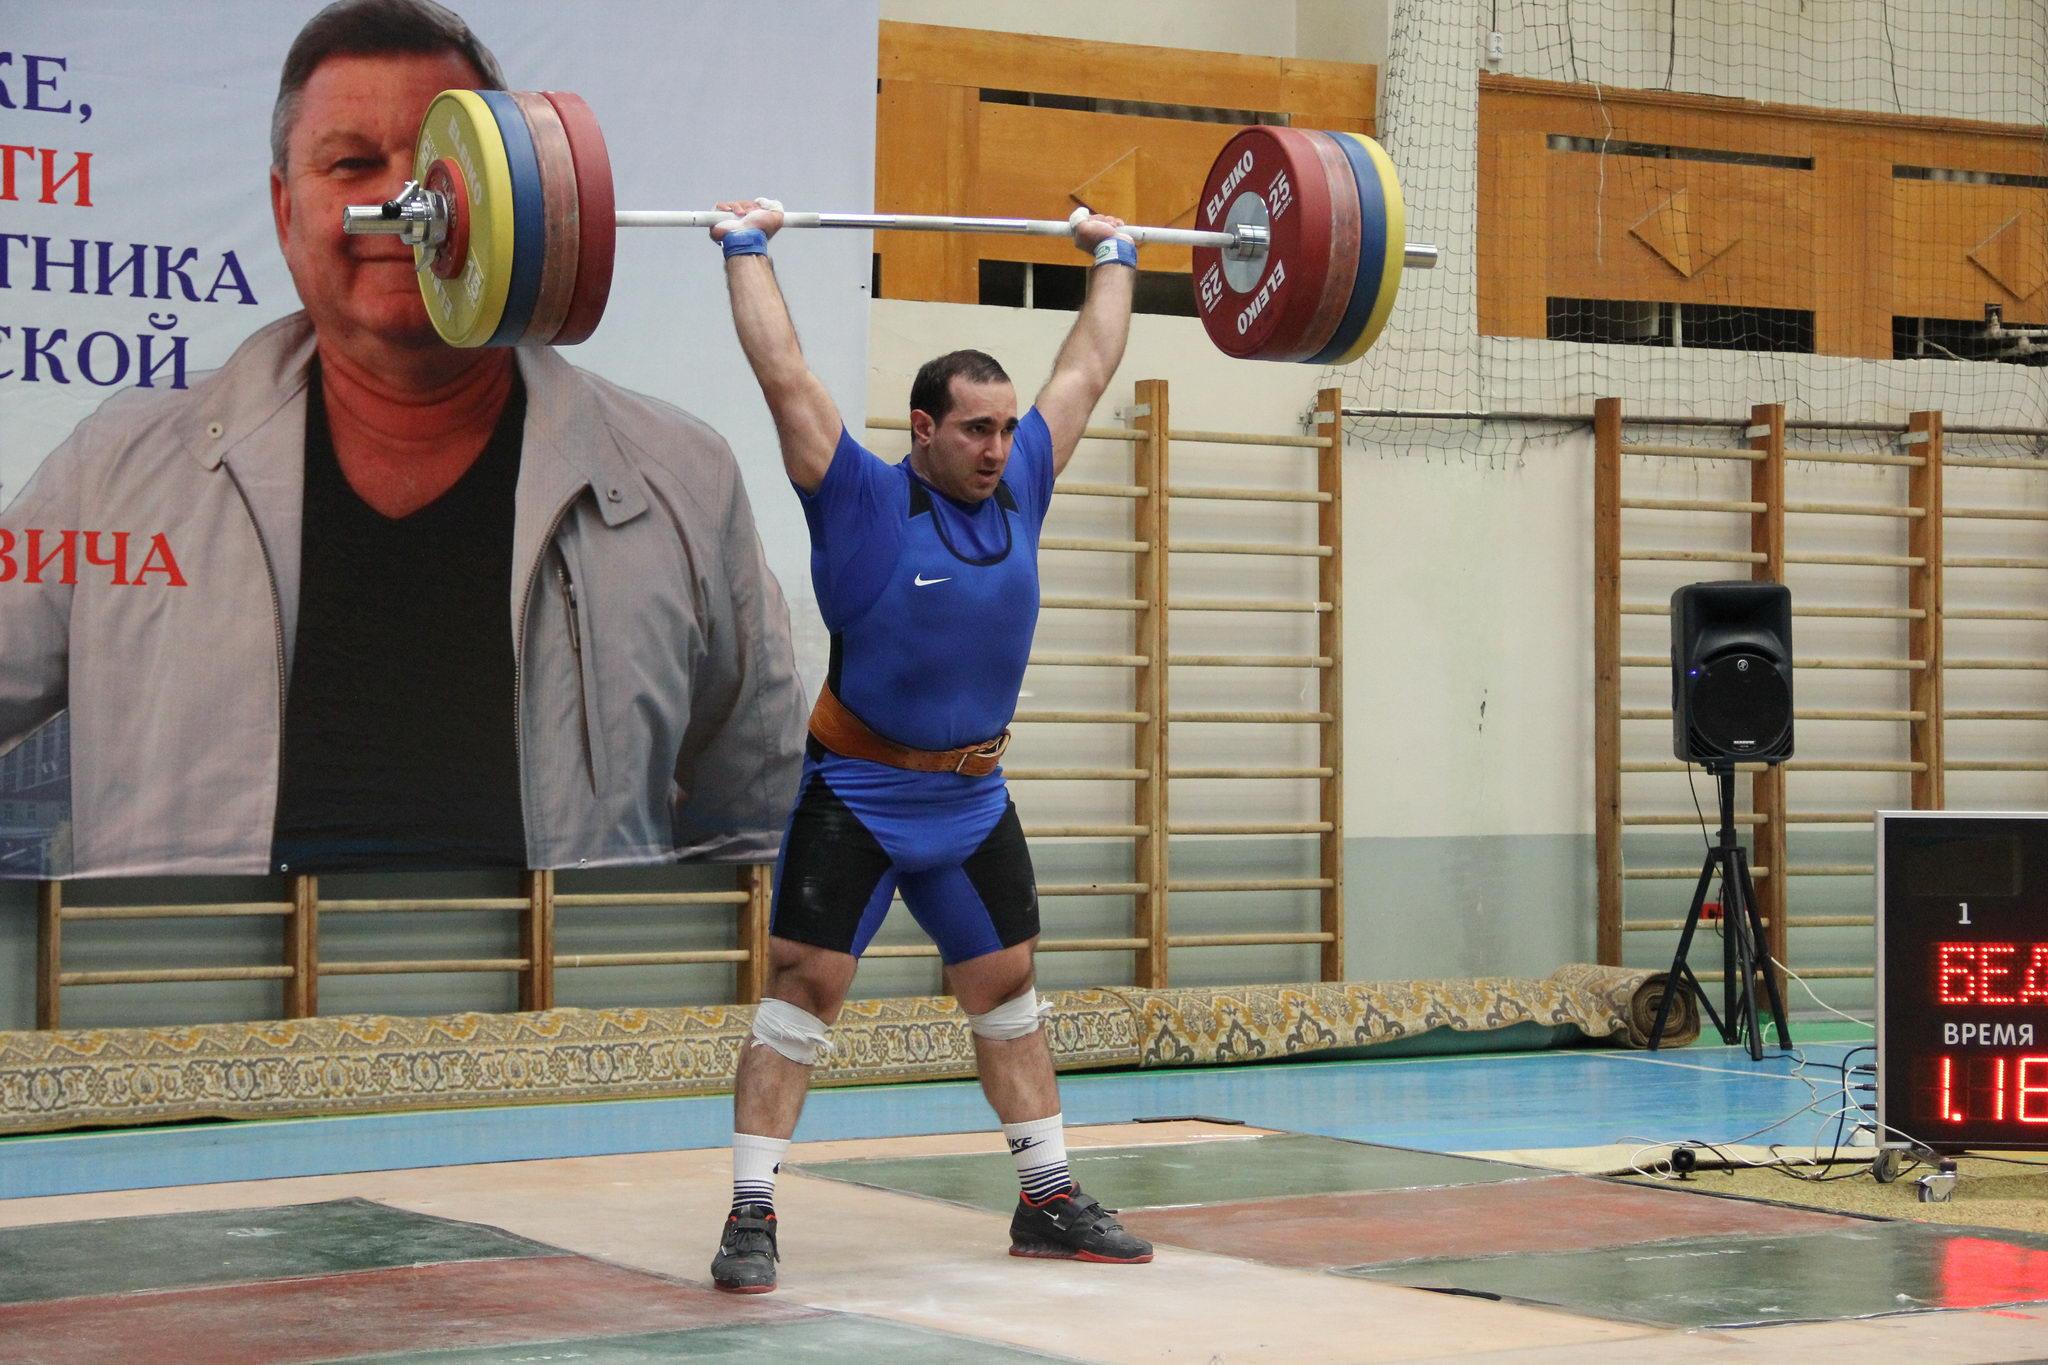 турнир по тяжелой атлетике фото